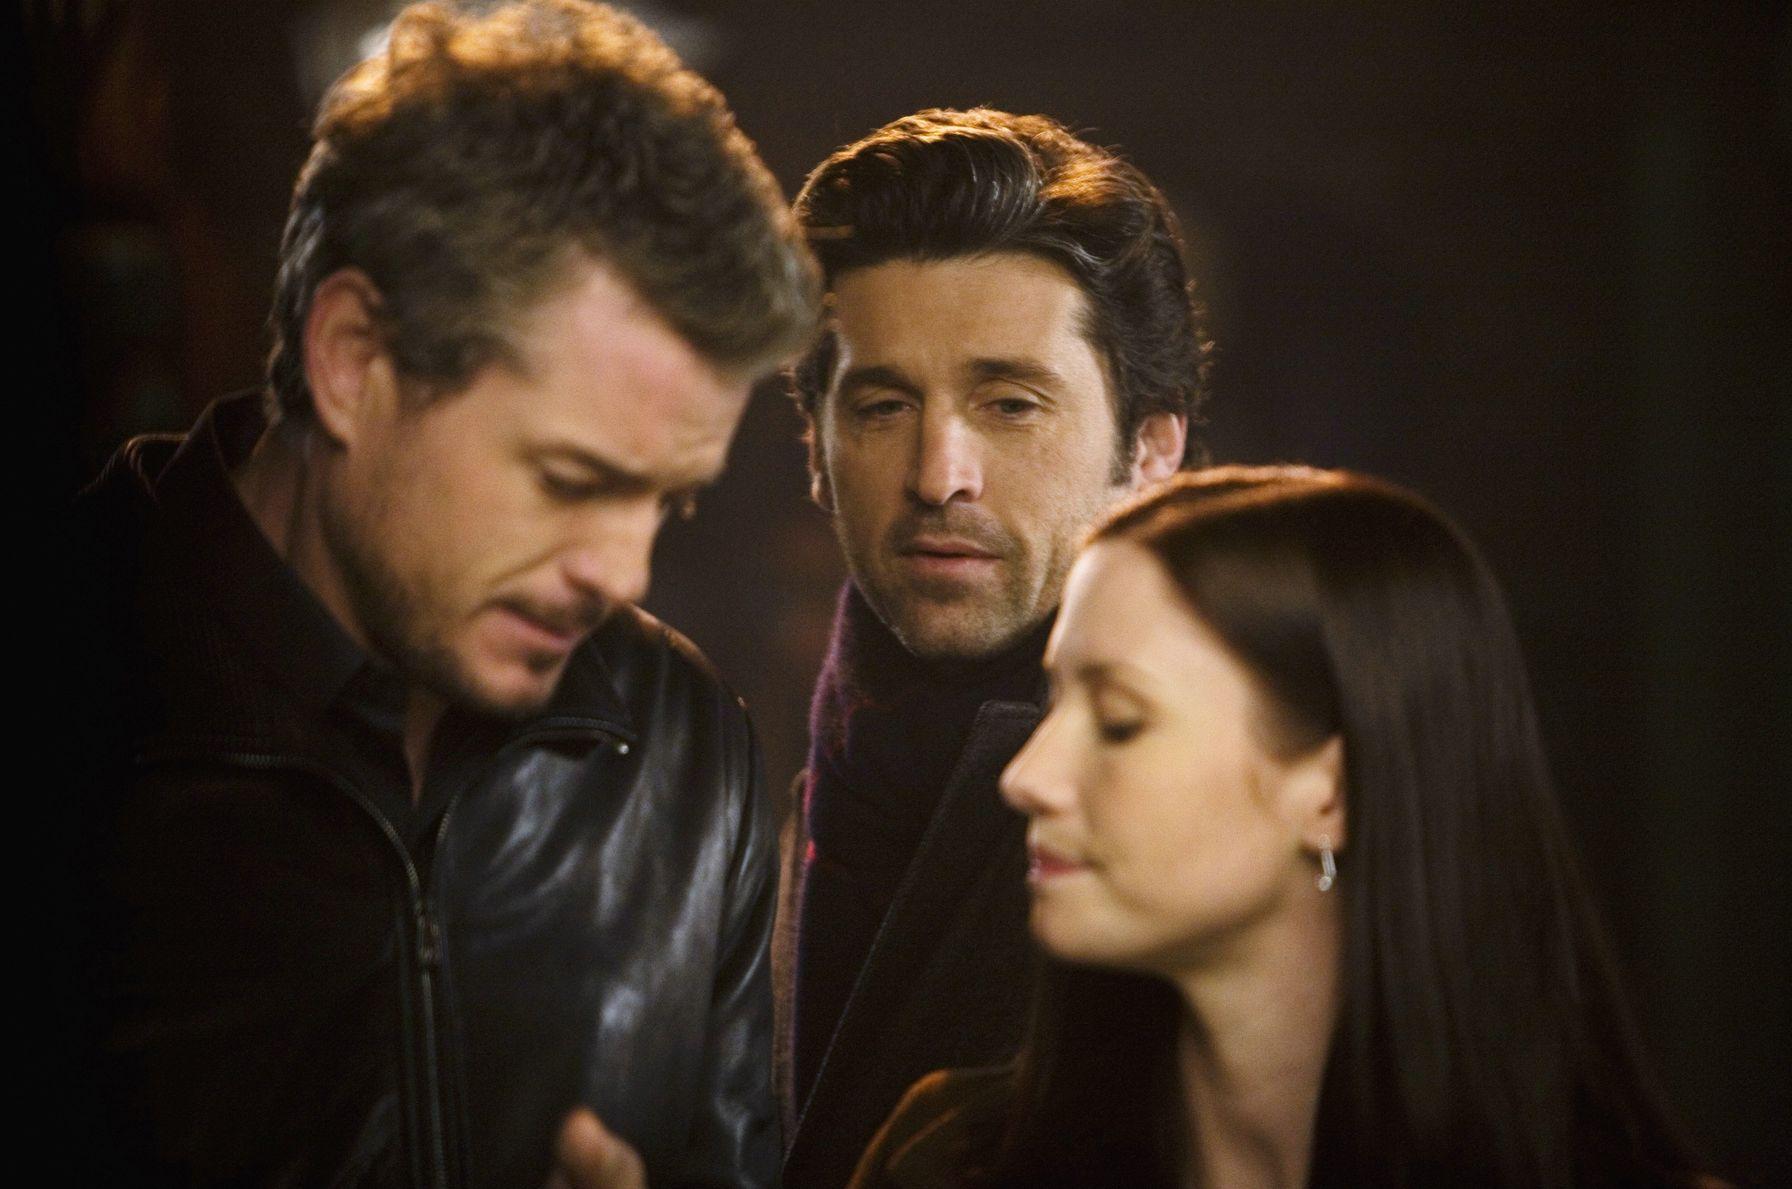 Grey Anatomy Saison 1 Torrent - tretonfax